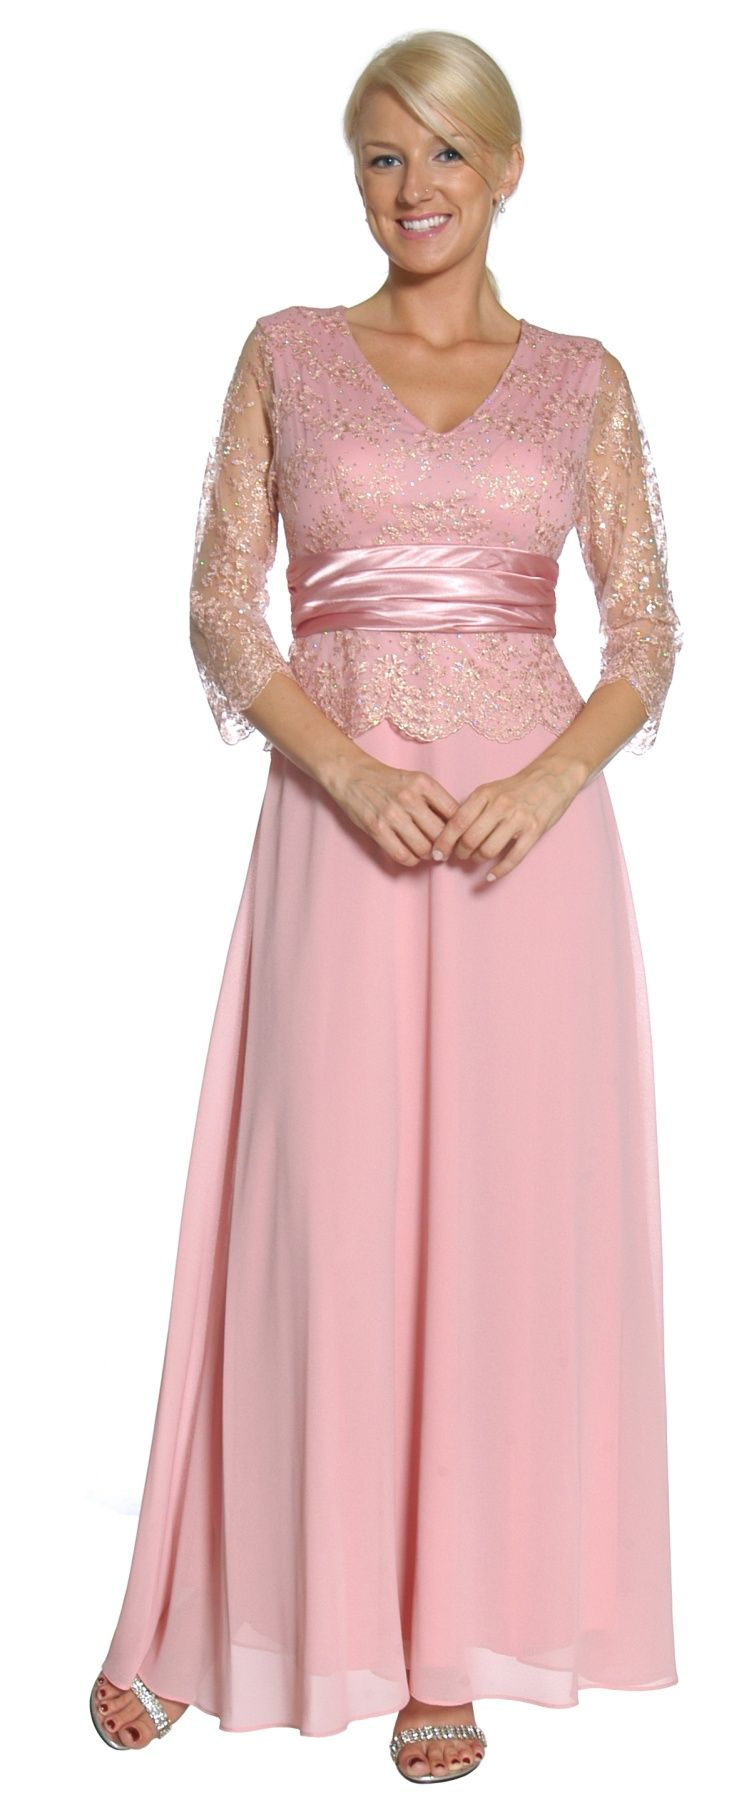 Mother Of The Bride Dresses Appleton Wi  Cocktail Dresses 2016